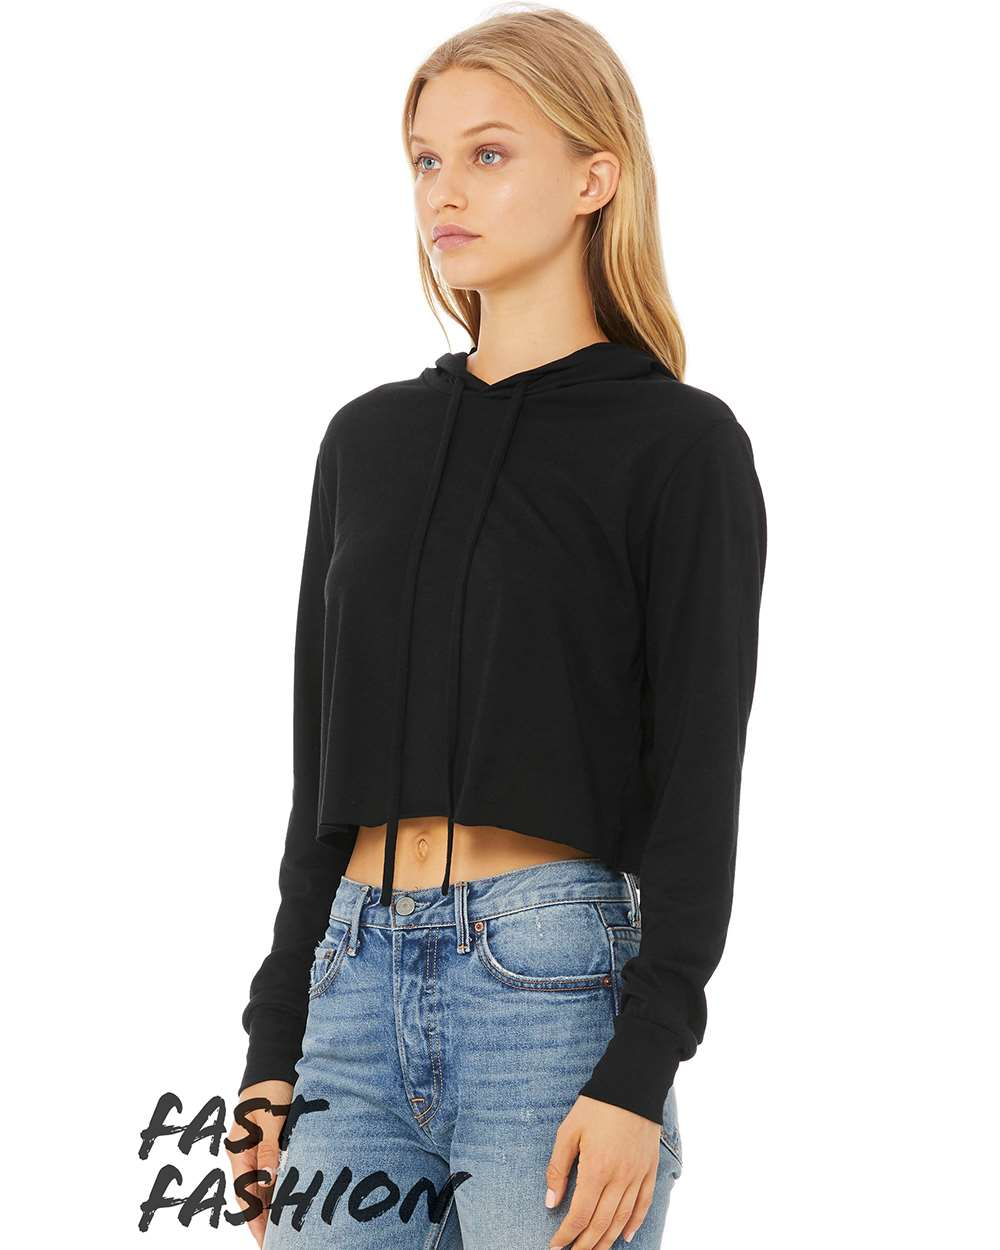 Bella+Canvas 8512 - Womens Triblend Cropped Long Sleeve Hoodie